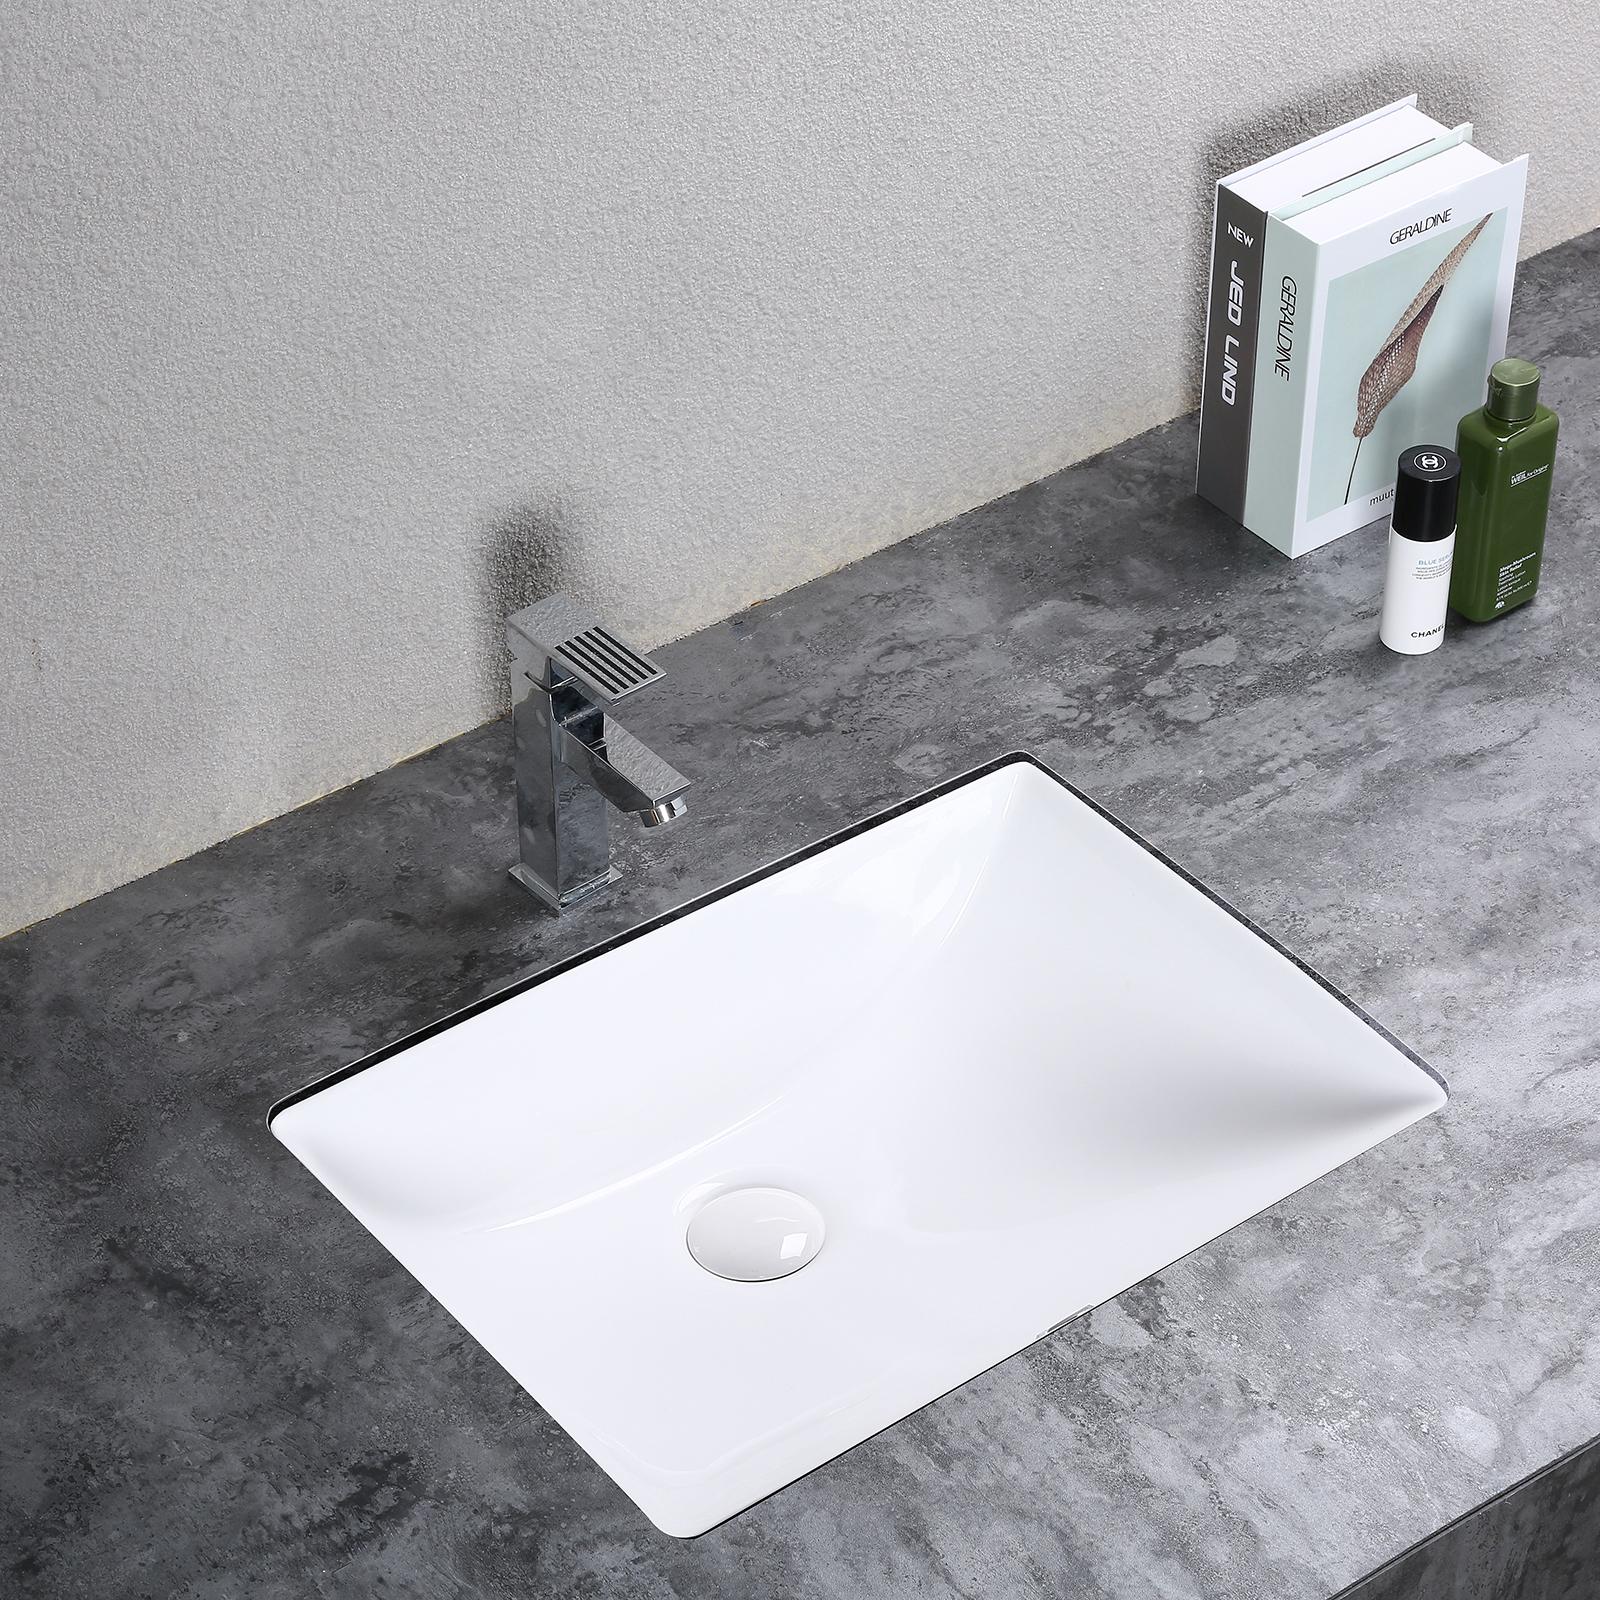 Attirant Details About Rectangular Ceramic Contemporary Undermount Basin Bathroom  Vanity Sink   White